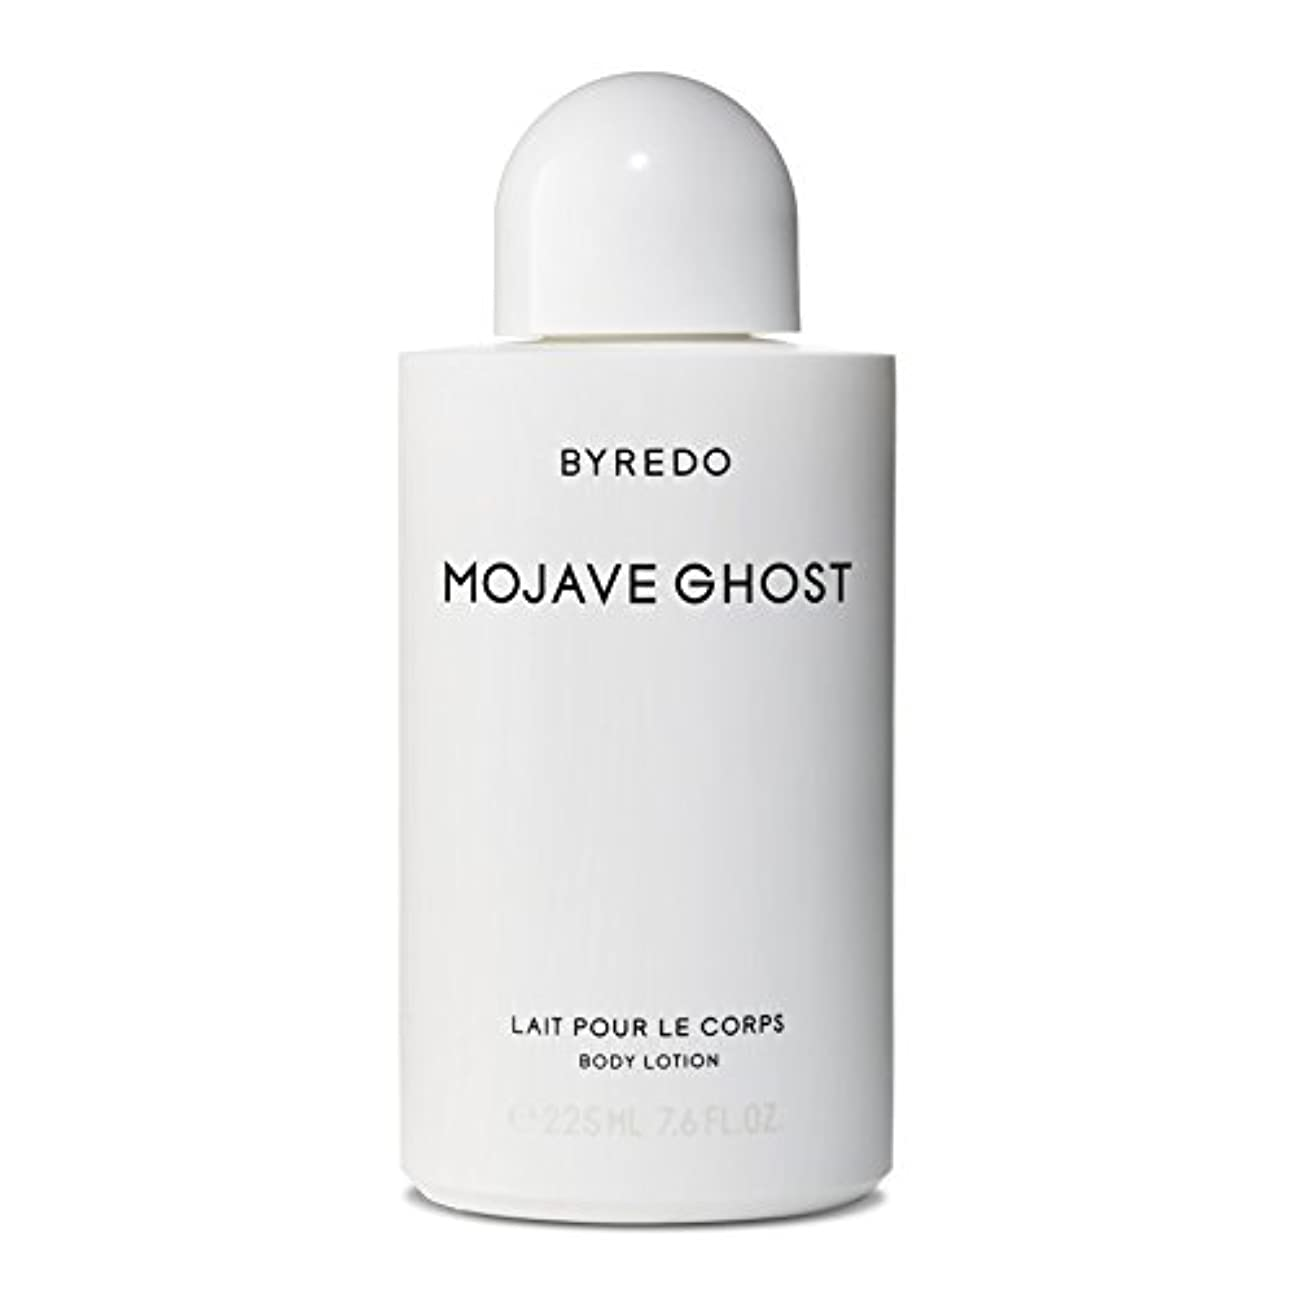 Byredo Mojave Ghost Body Lotion - モハーベゴーストボディローション [並行輸入品]